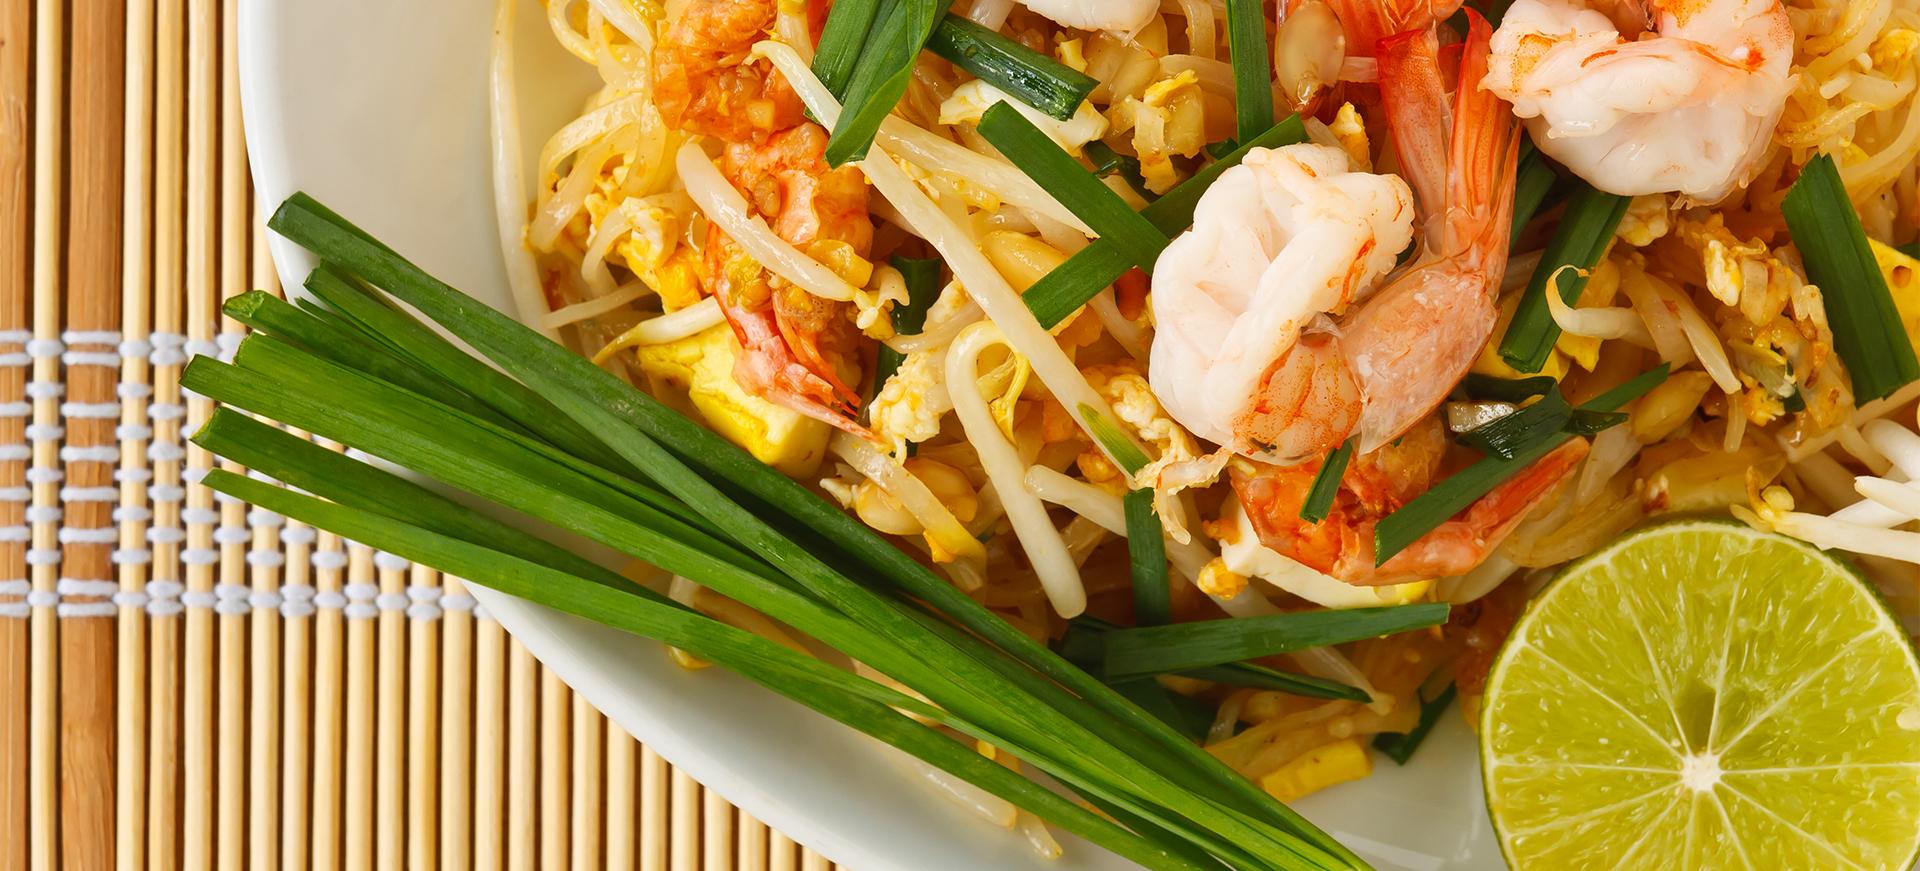 Thailand-Culinary-Journey-Thumb-Resize-H.jpg